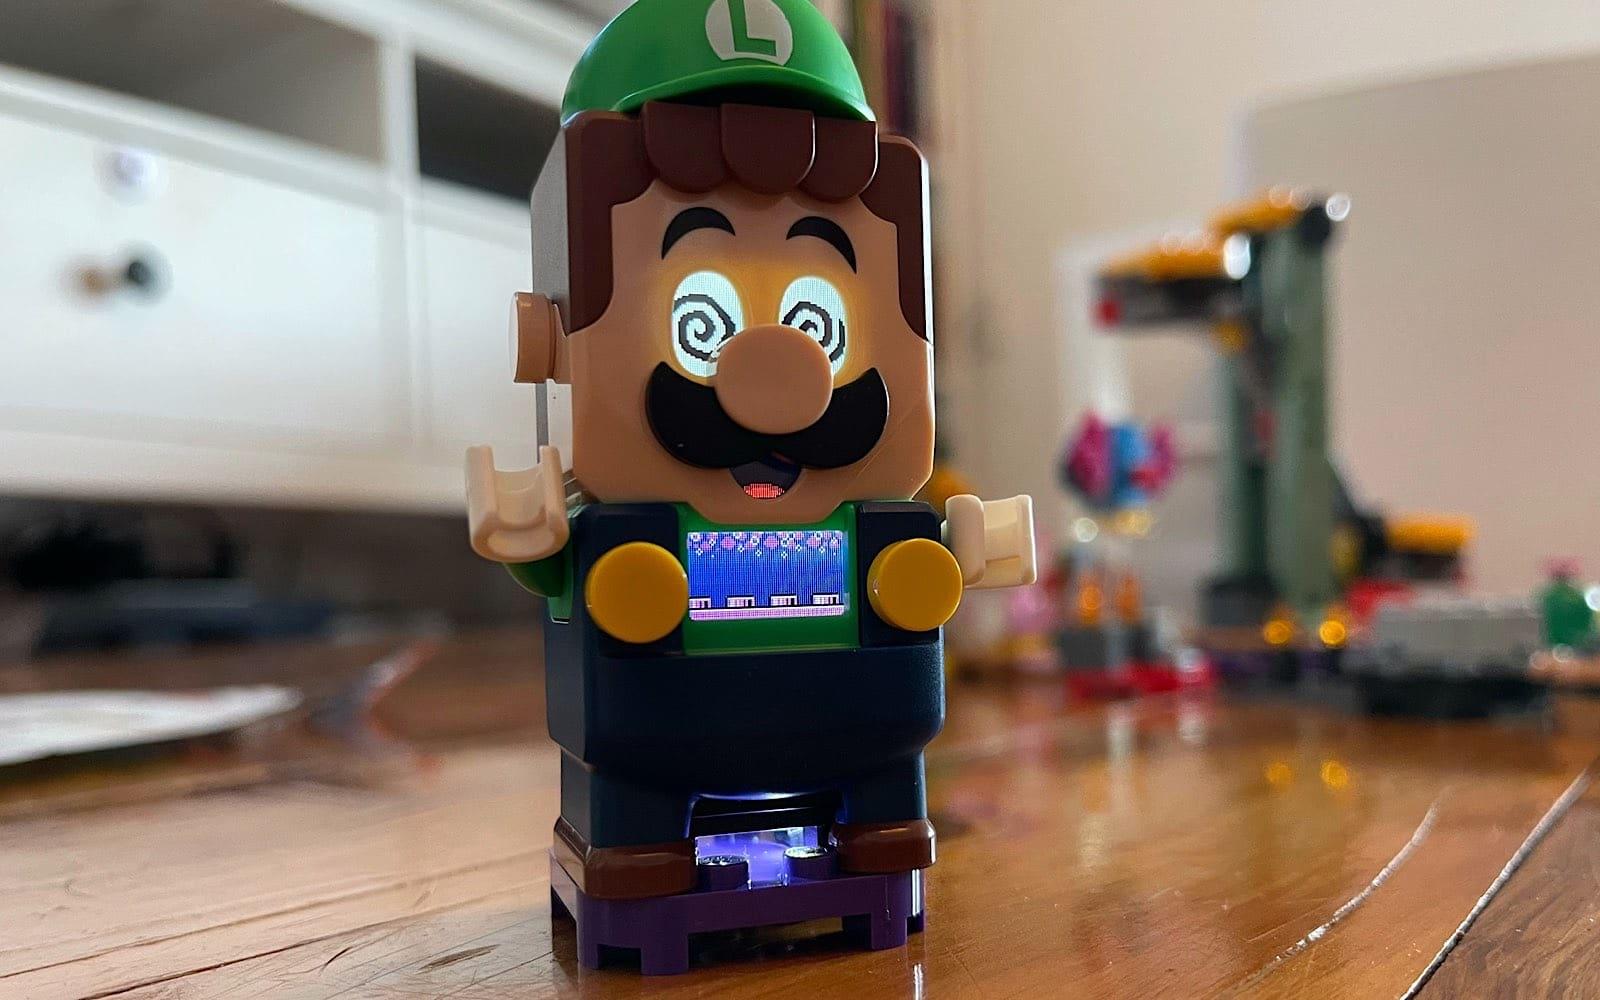 Don't let Luigi land on anything purple.